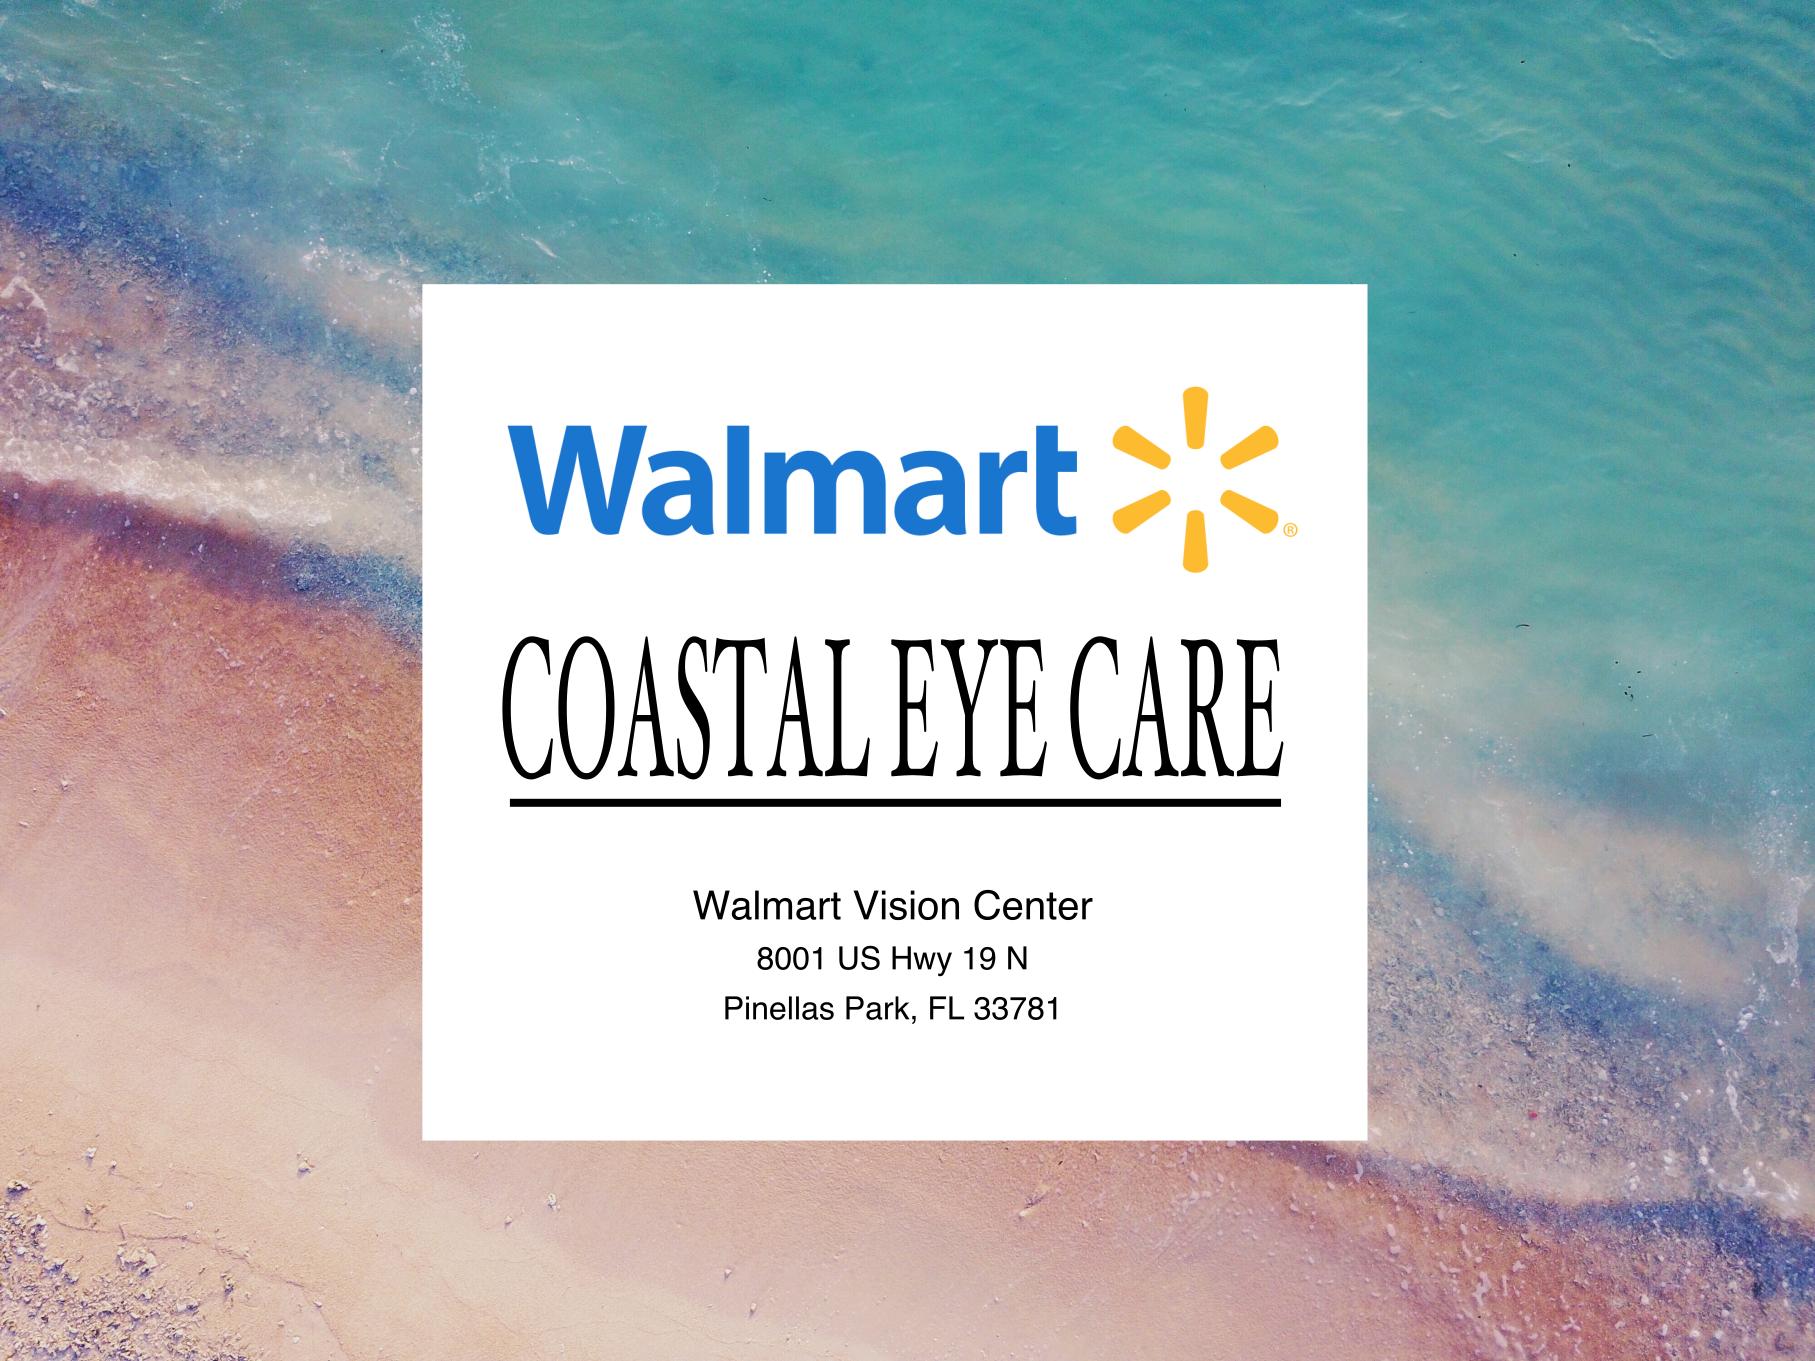 New Location in Pinellas Park - Coastal Eye Care